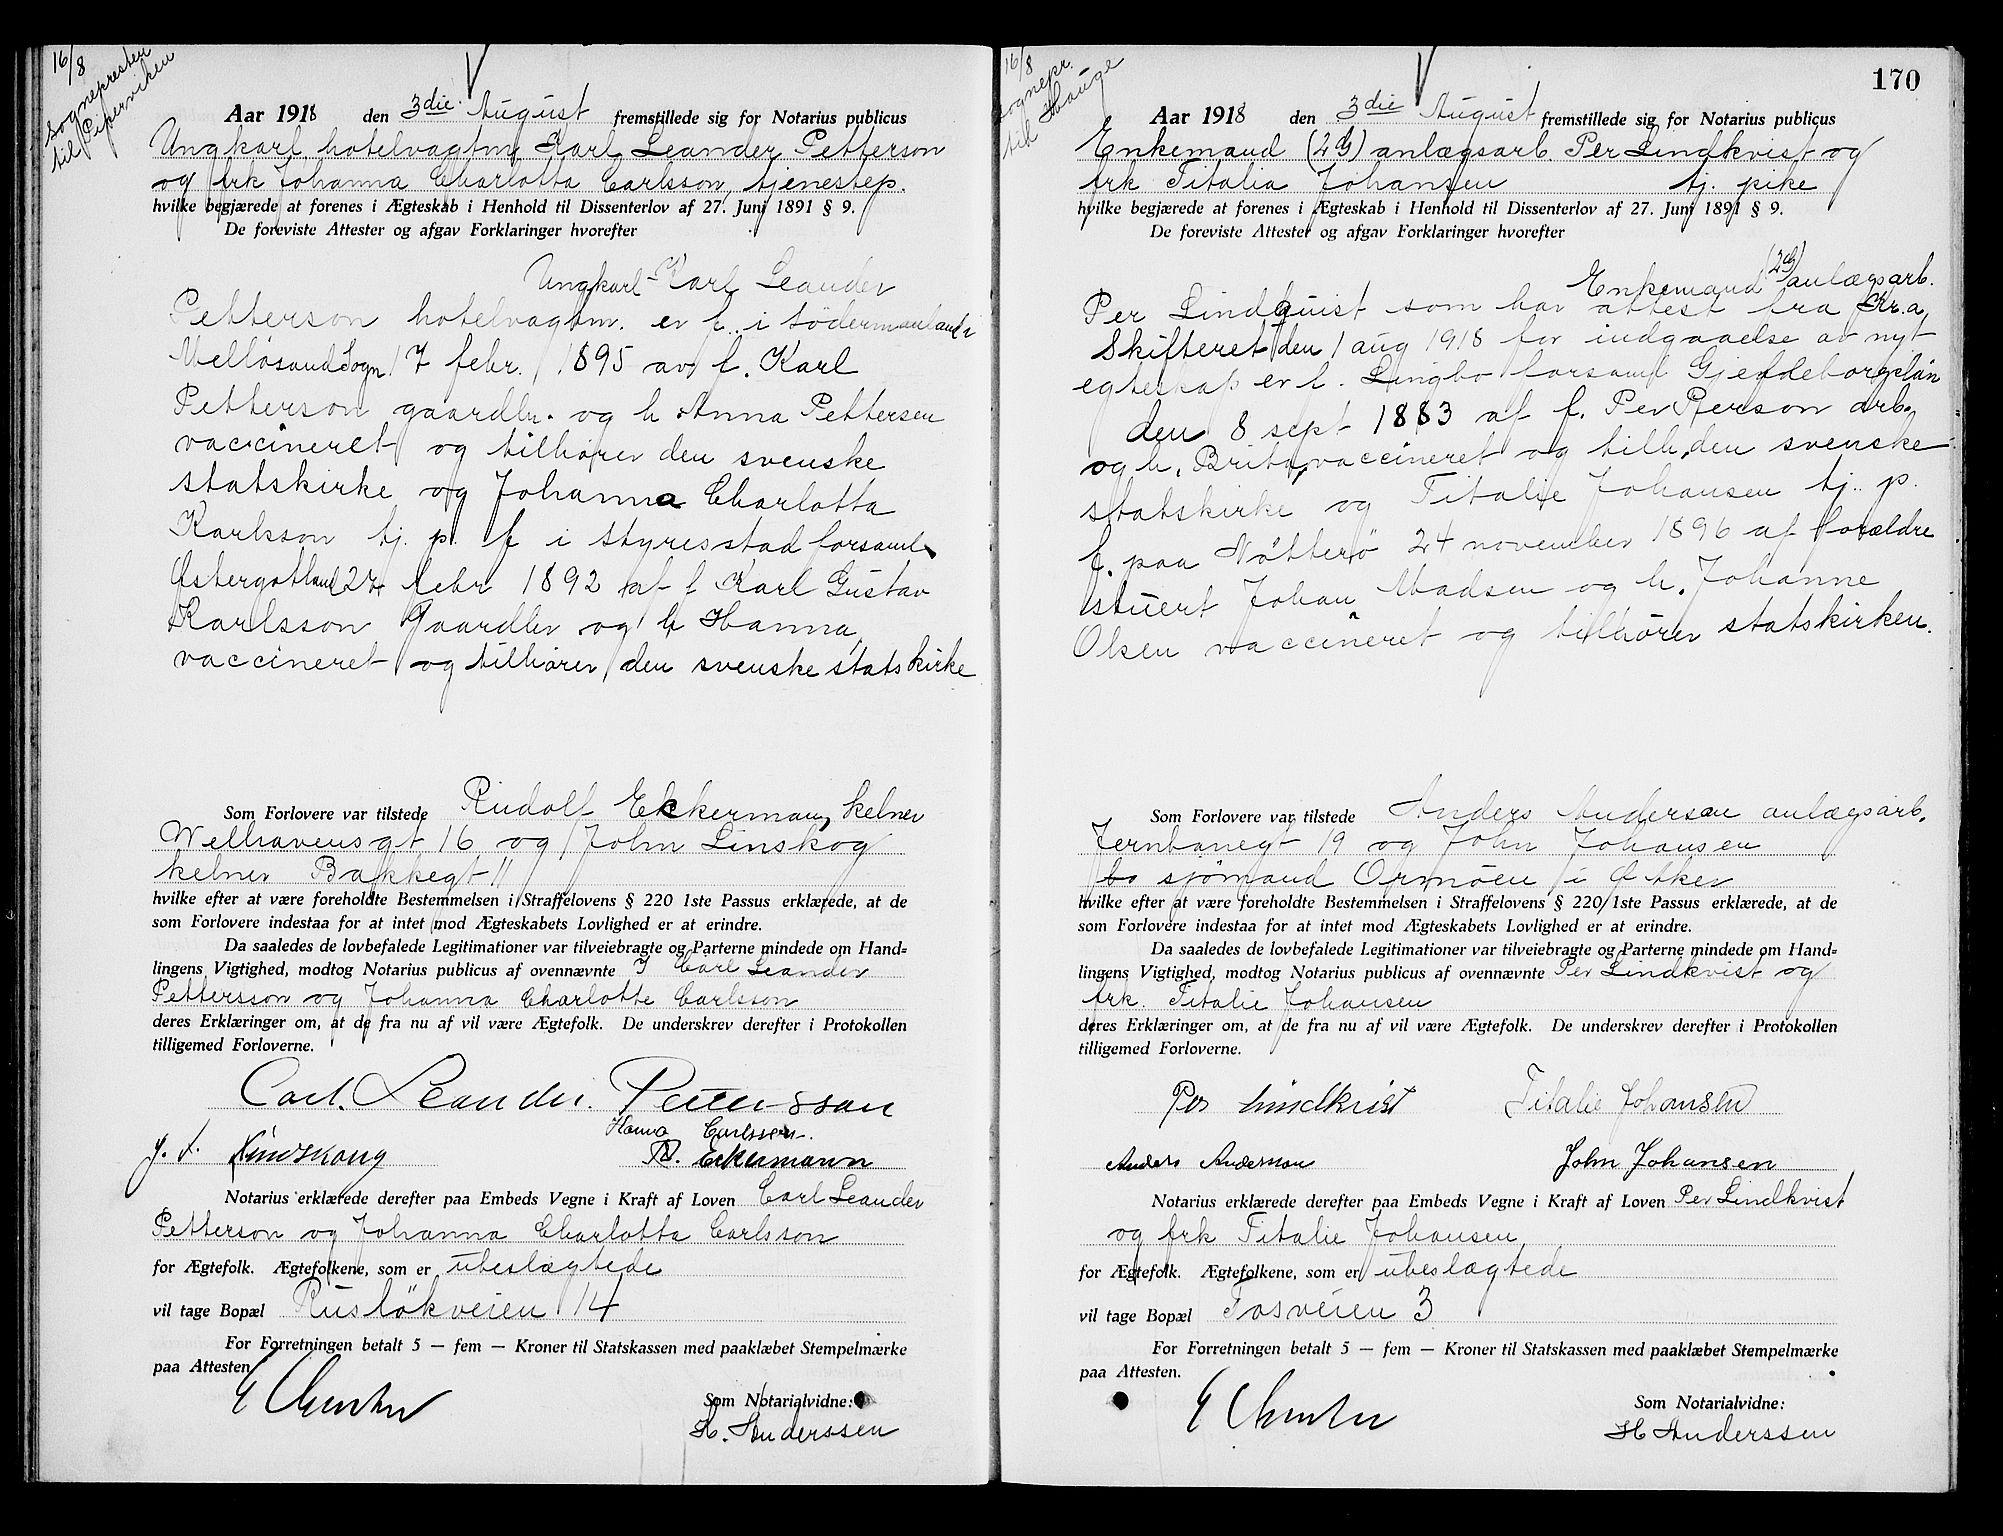 SAO, Oslo byfogd avd. I, L/Lb/Lbb/L0012: Notarialprotokoll, rekke II: Vigsler, 1918-1919, s. 169b-170a